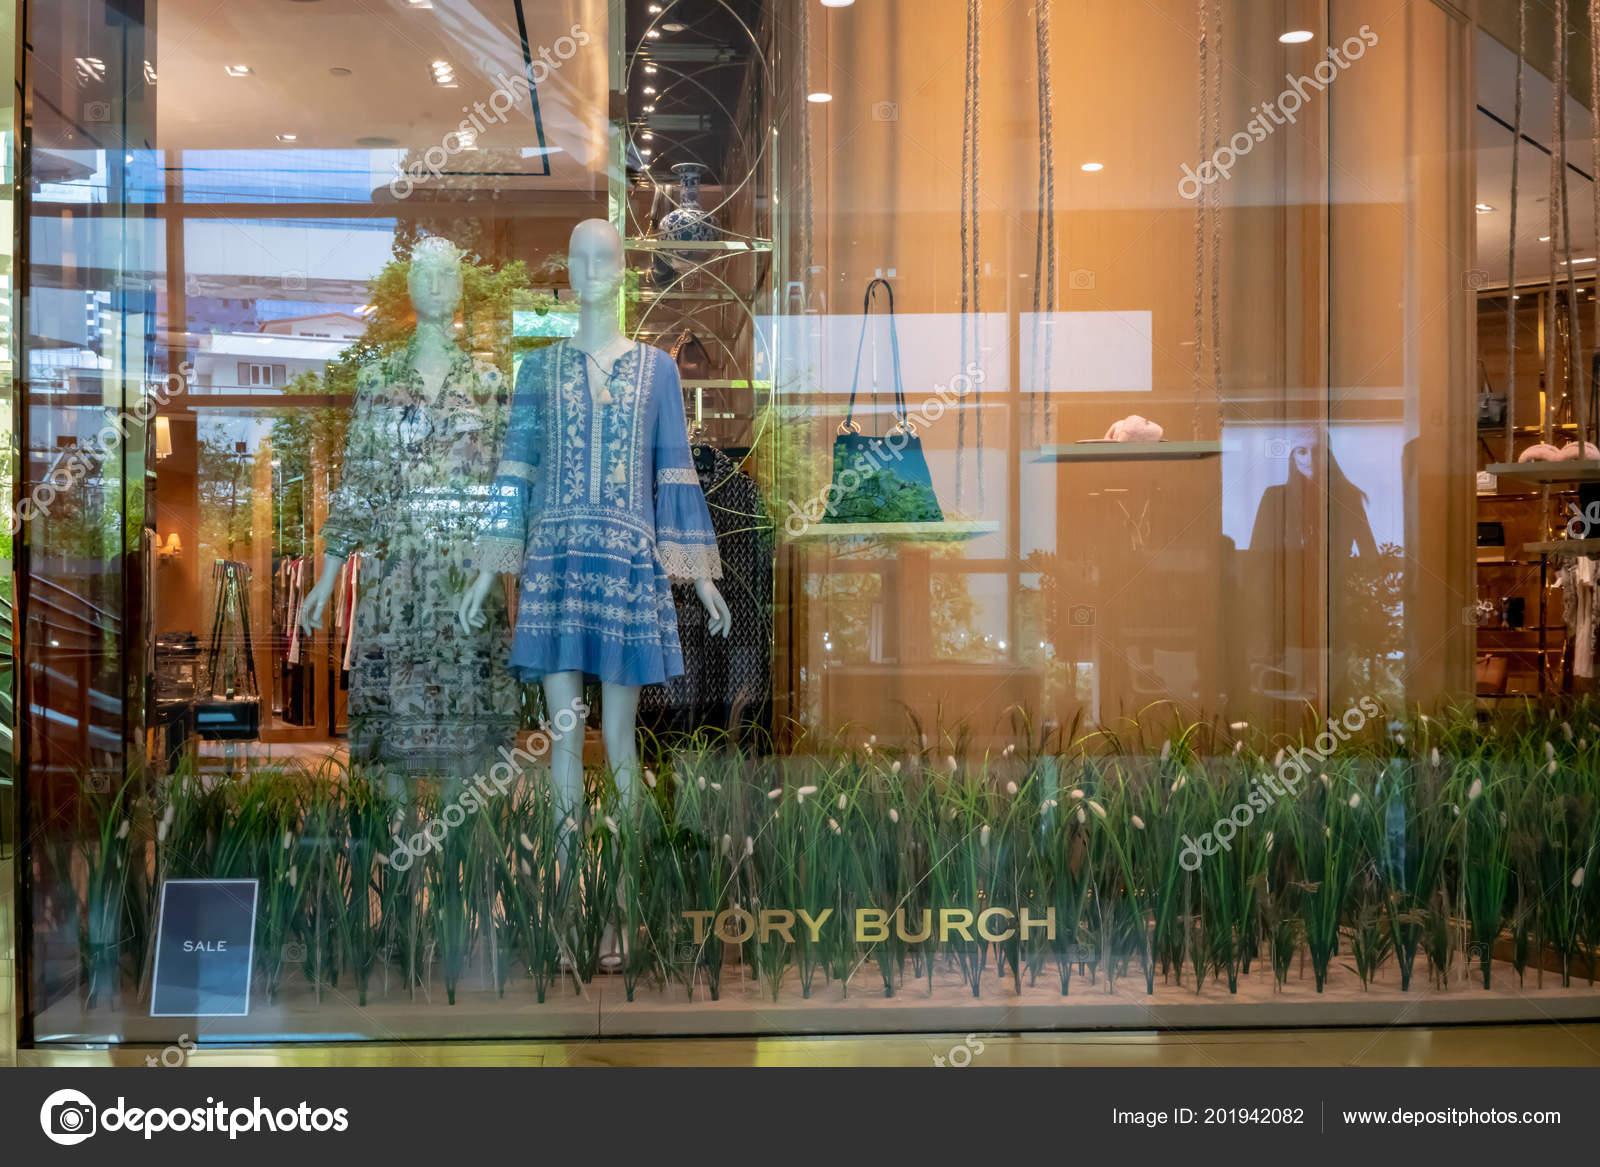 18636eda57de Tory Burch Shop Emquatier Bangkok Thailand June 2018 Luxury Fashionable —  Stock Photo